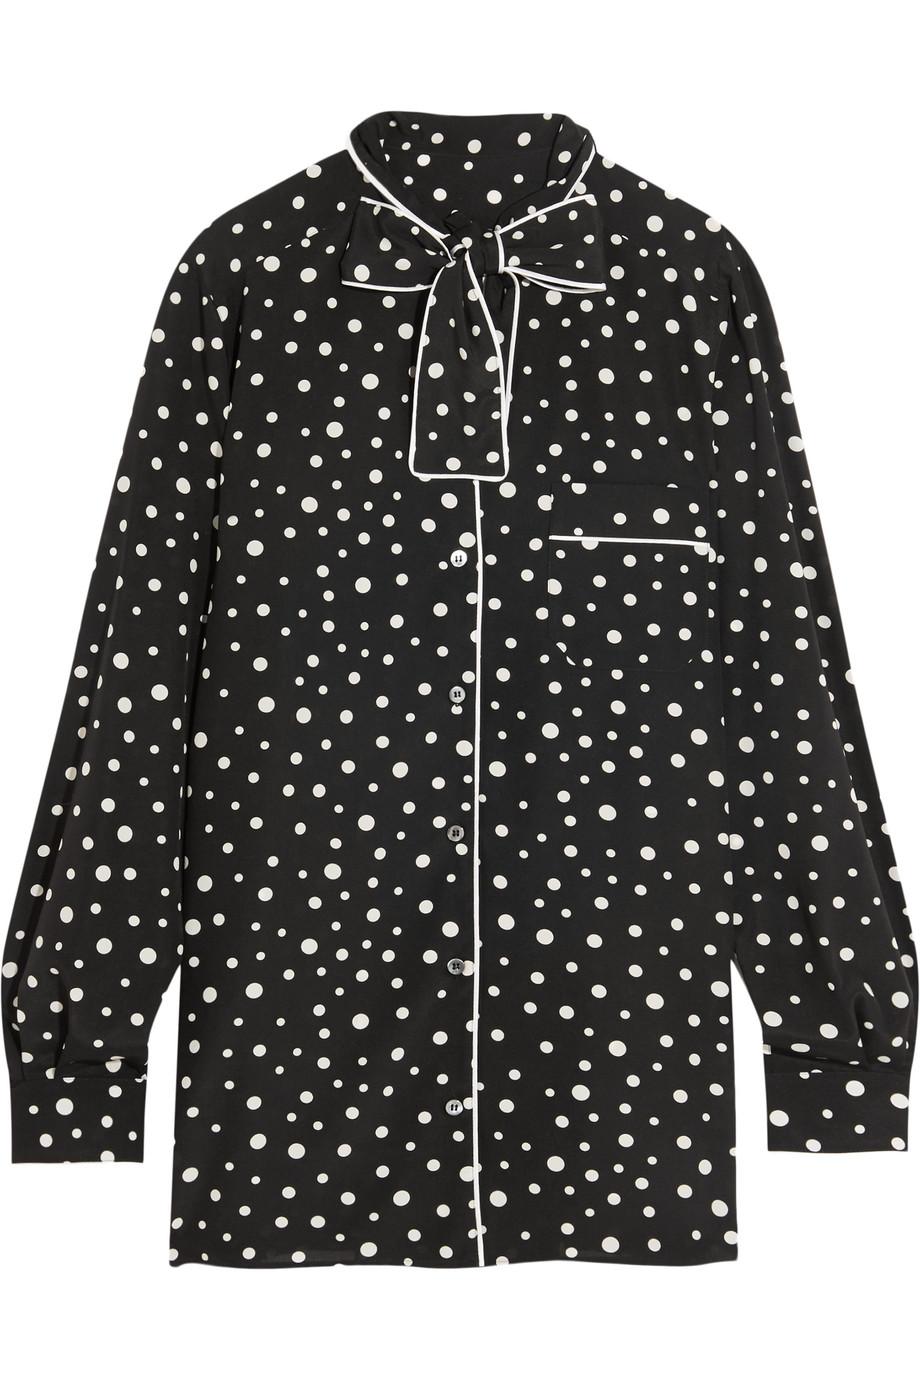 Dolce & Gabbana Pussy-Bow Polka-Dot Stretch-Silk Crepe De Chine Blouse, Black, Women's, Size: 46